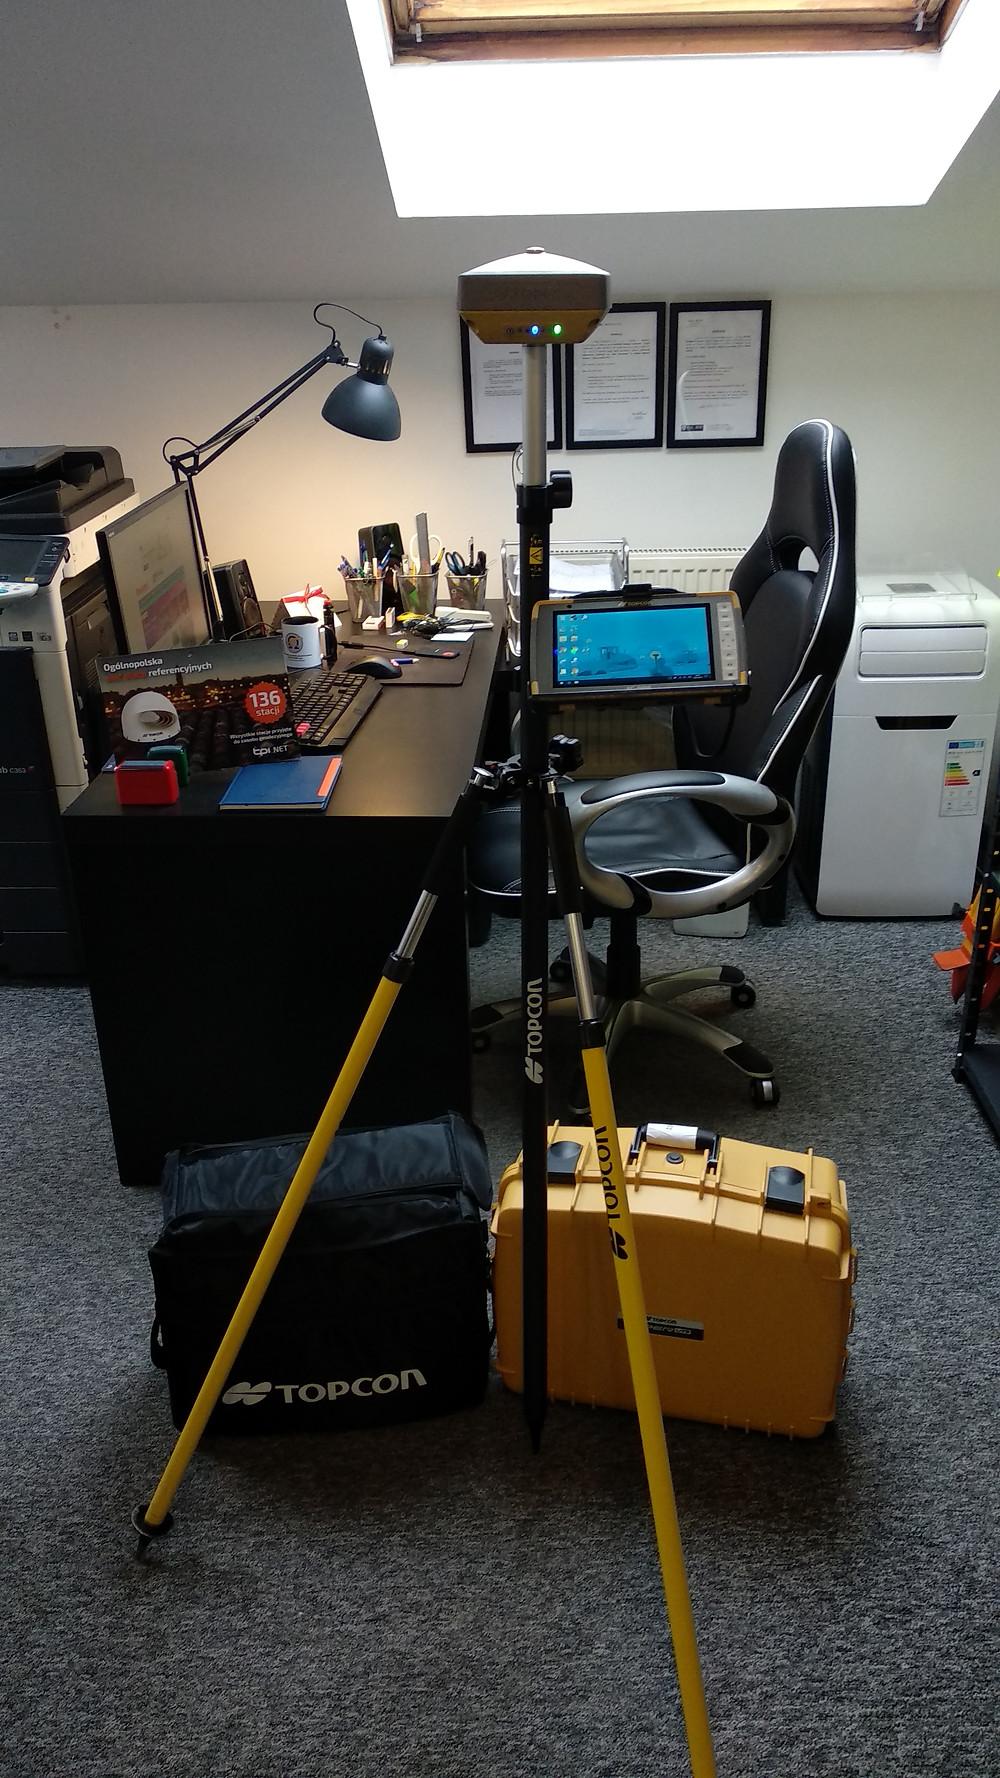 Topcon Hiper VR, FC-5000